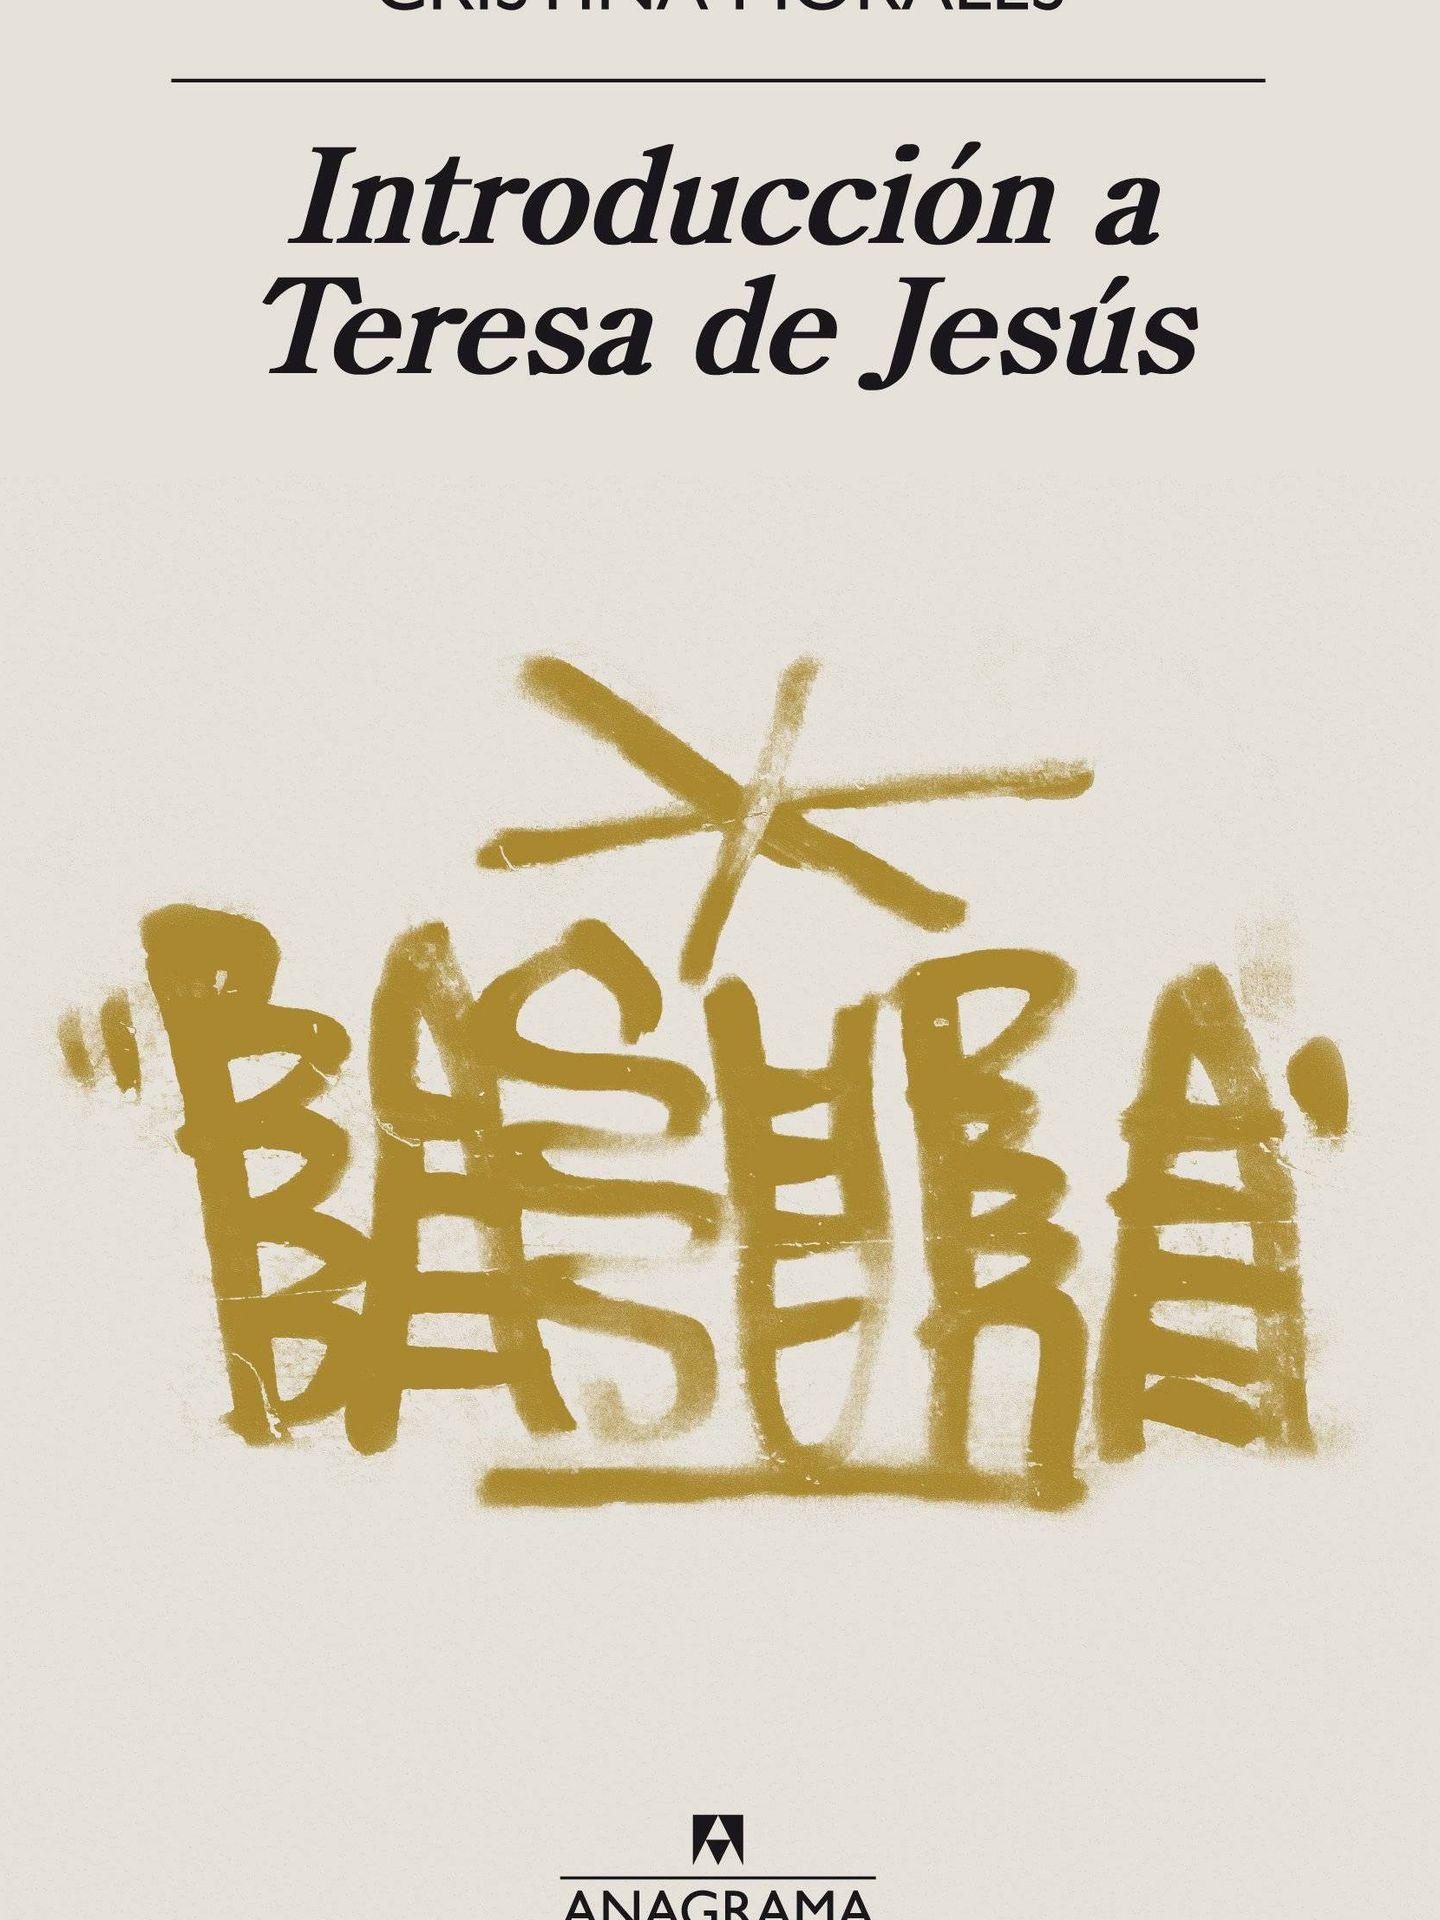 'Intrducción a Teresa de Jesús' (Anagrama)